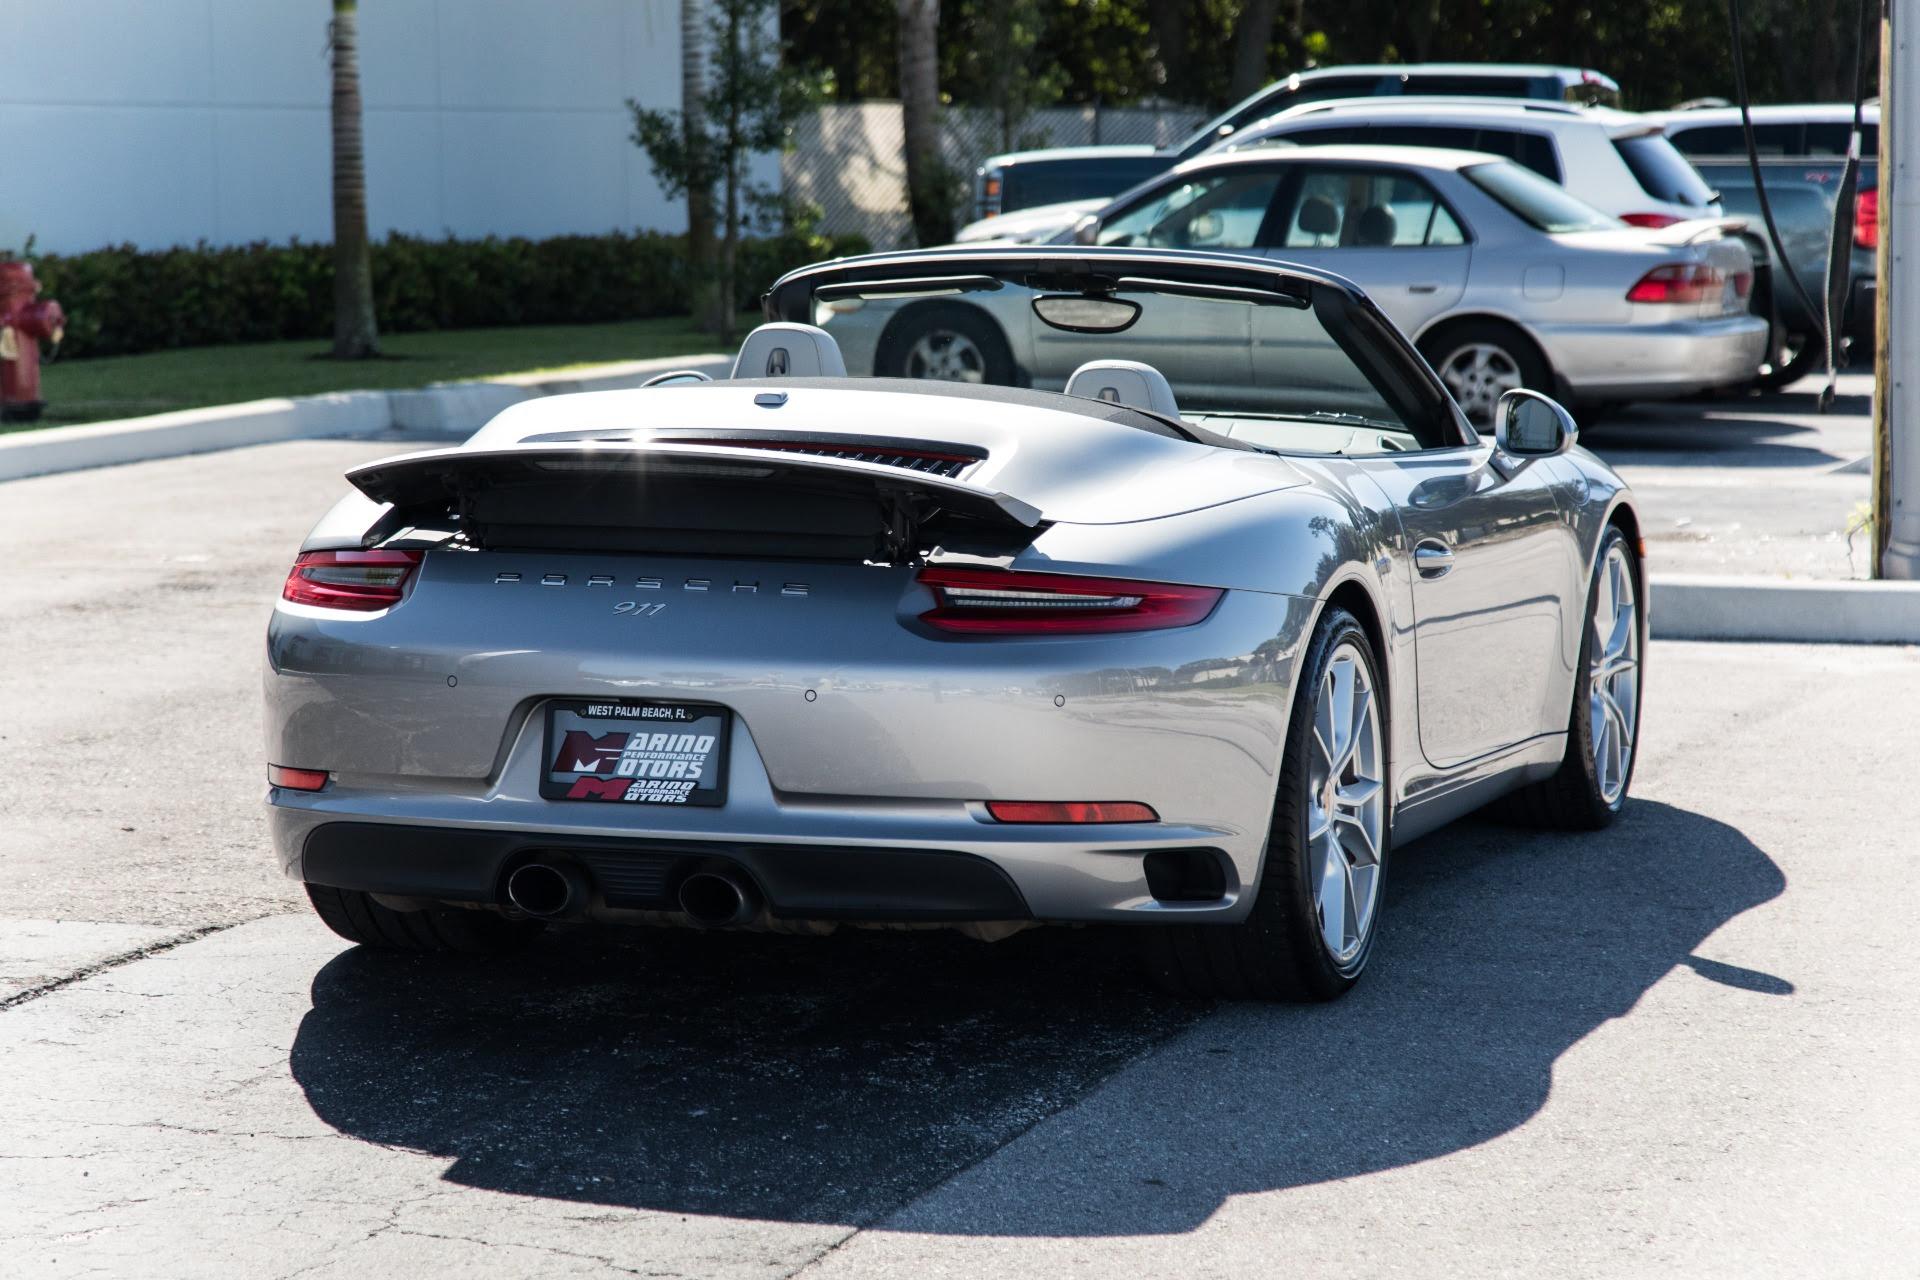 Used 2017 Porsche 911 Carrera S For Sale ($92,900) | Marino Performance Motors Stock #154428